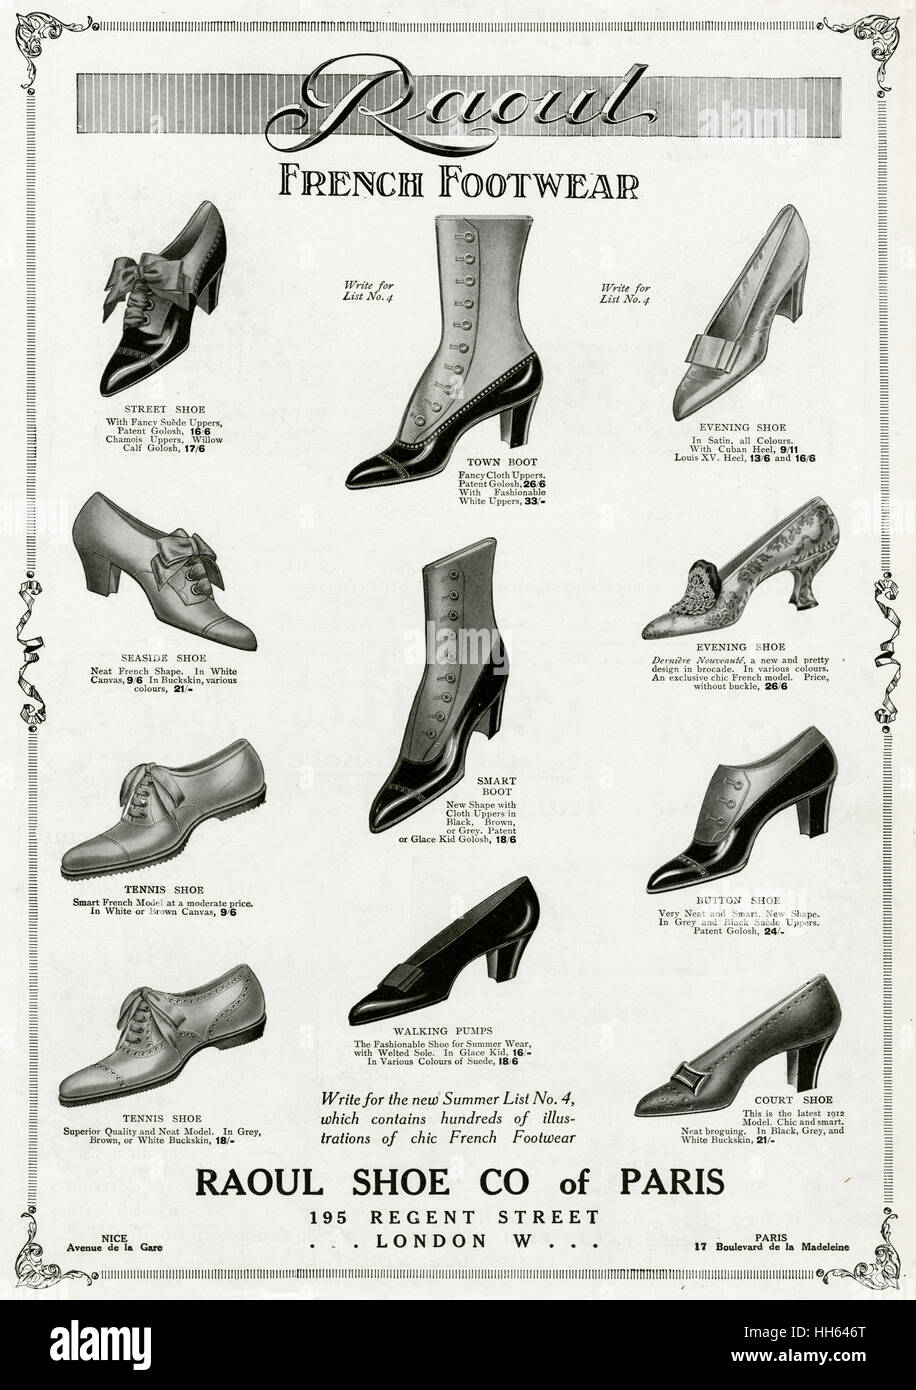 d1ace7412bab Shoe Advert Stock Photos   Shoe Advert Stock Images - Alamy